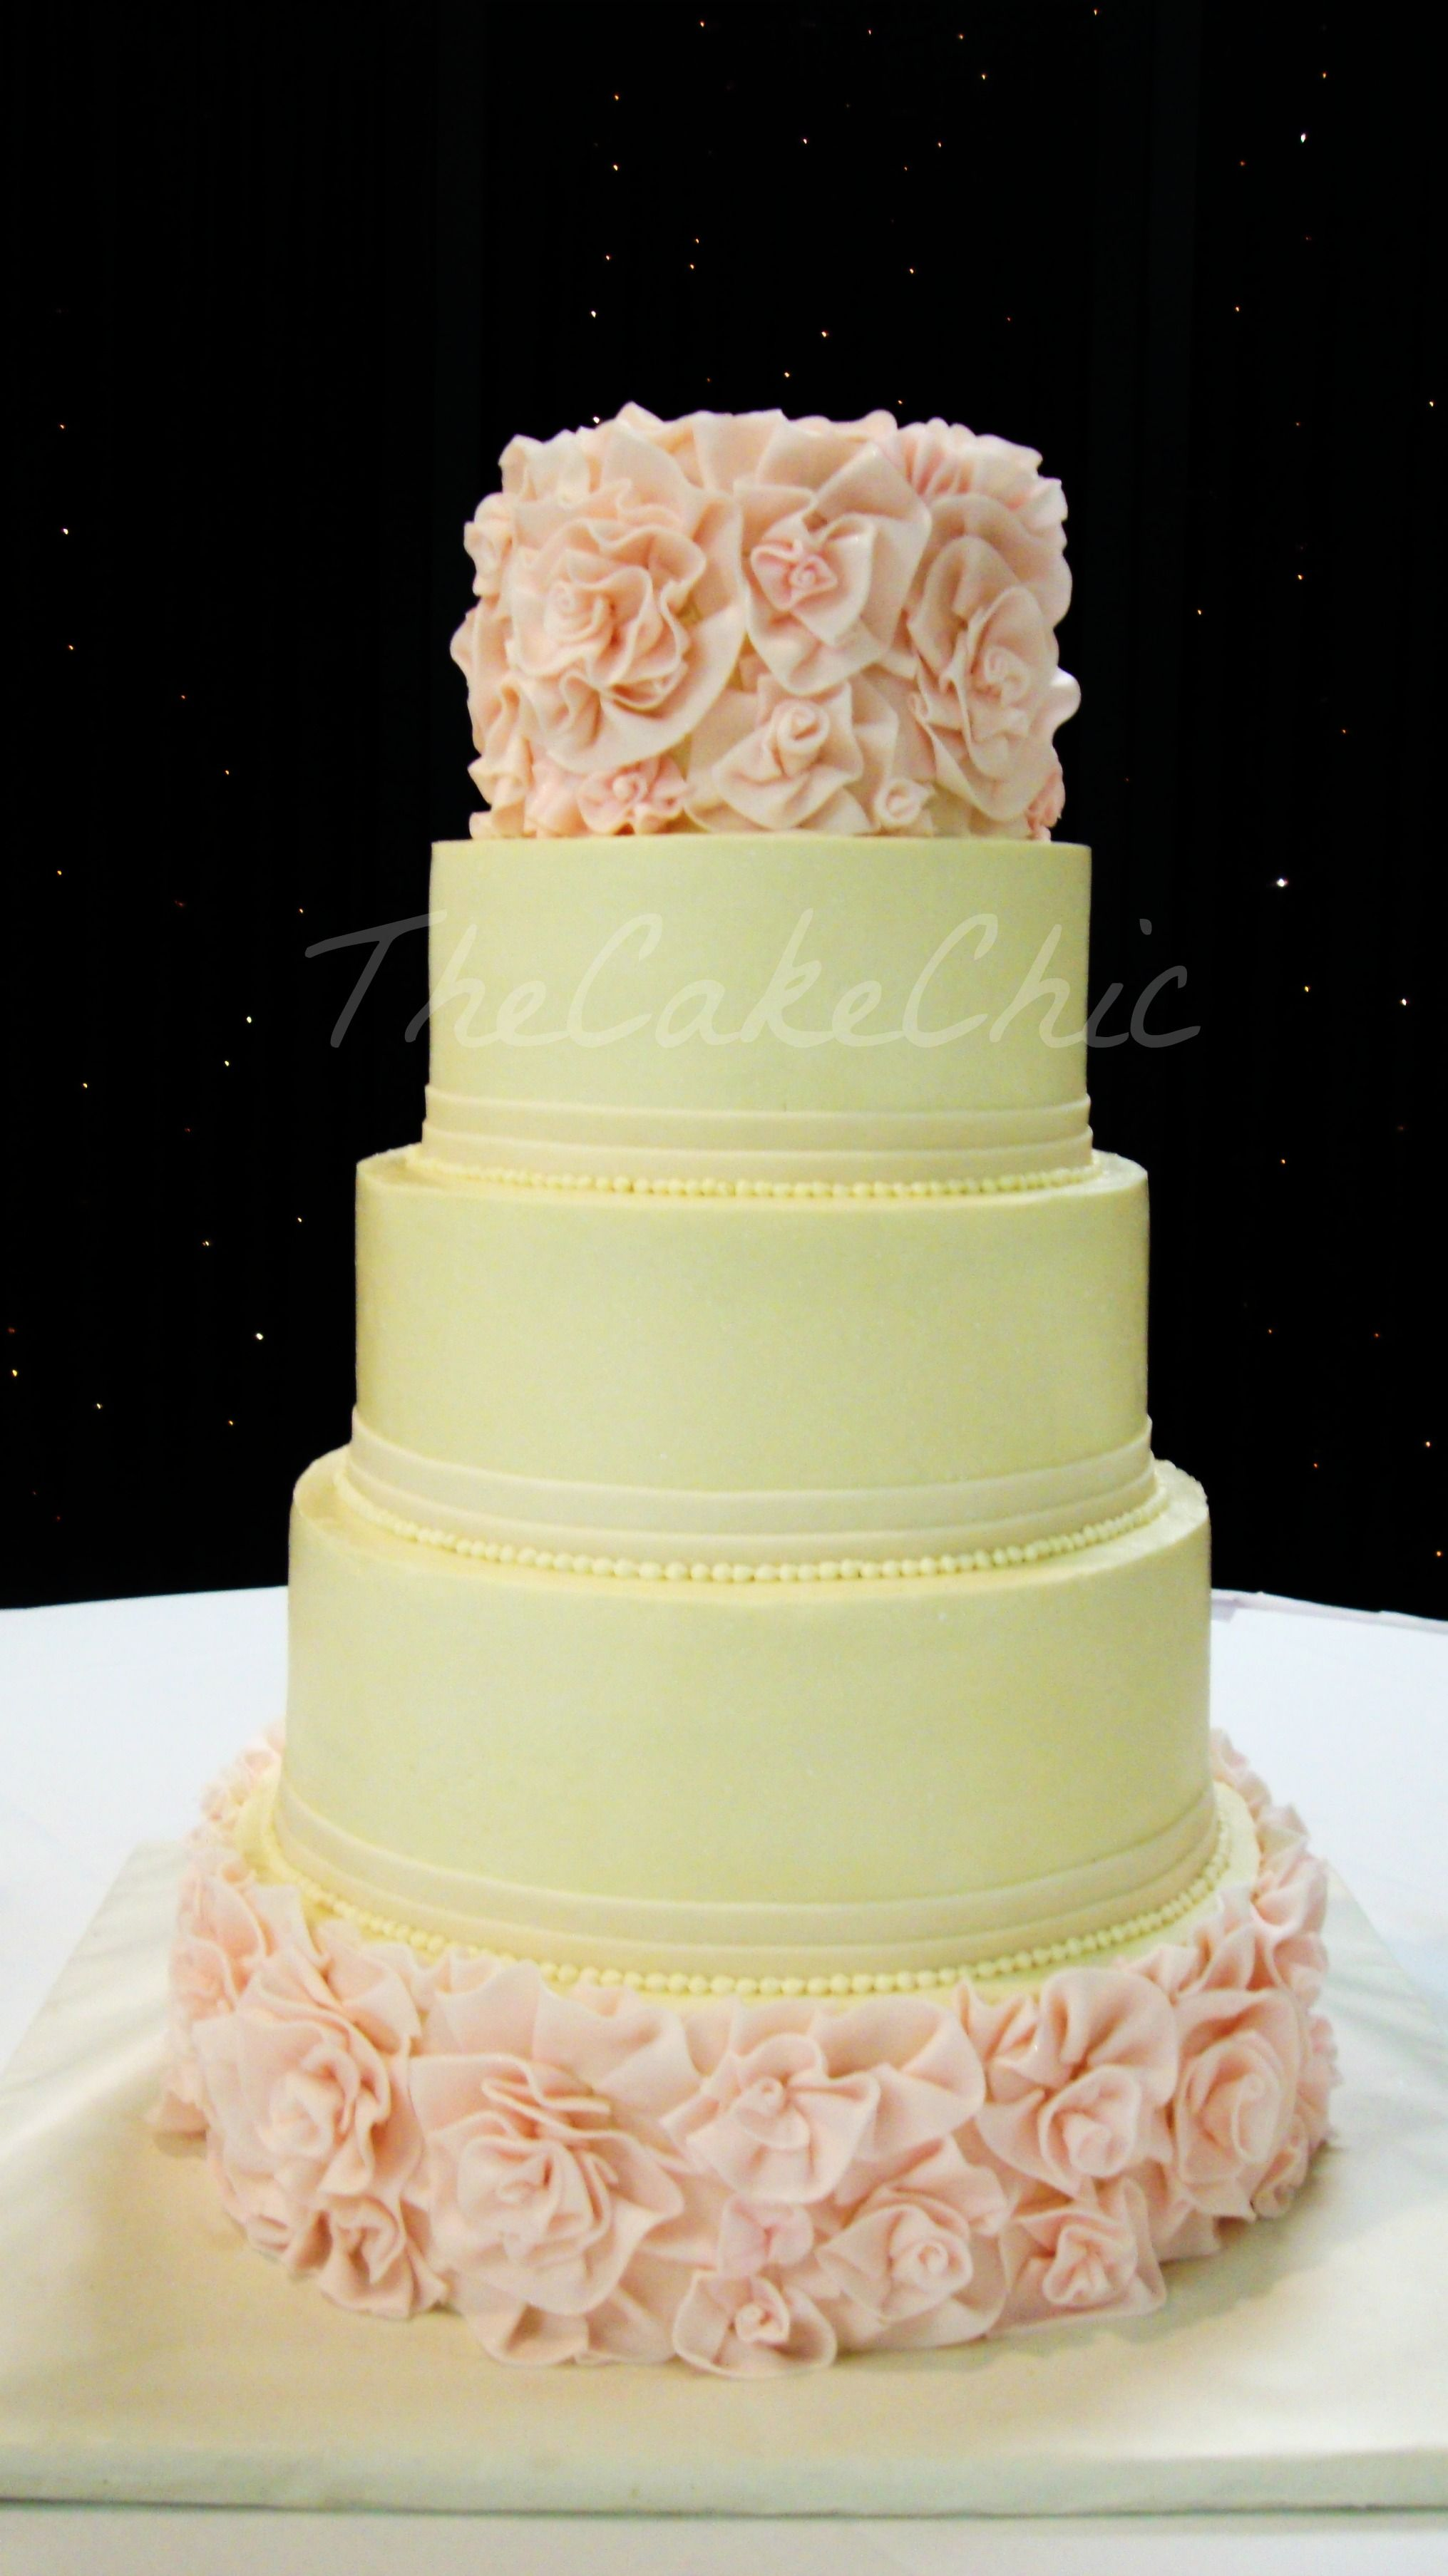 Ivory and Blush Flower Ruffle Wedding Cake. From bottom: Vanilla ...